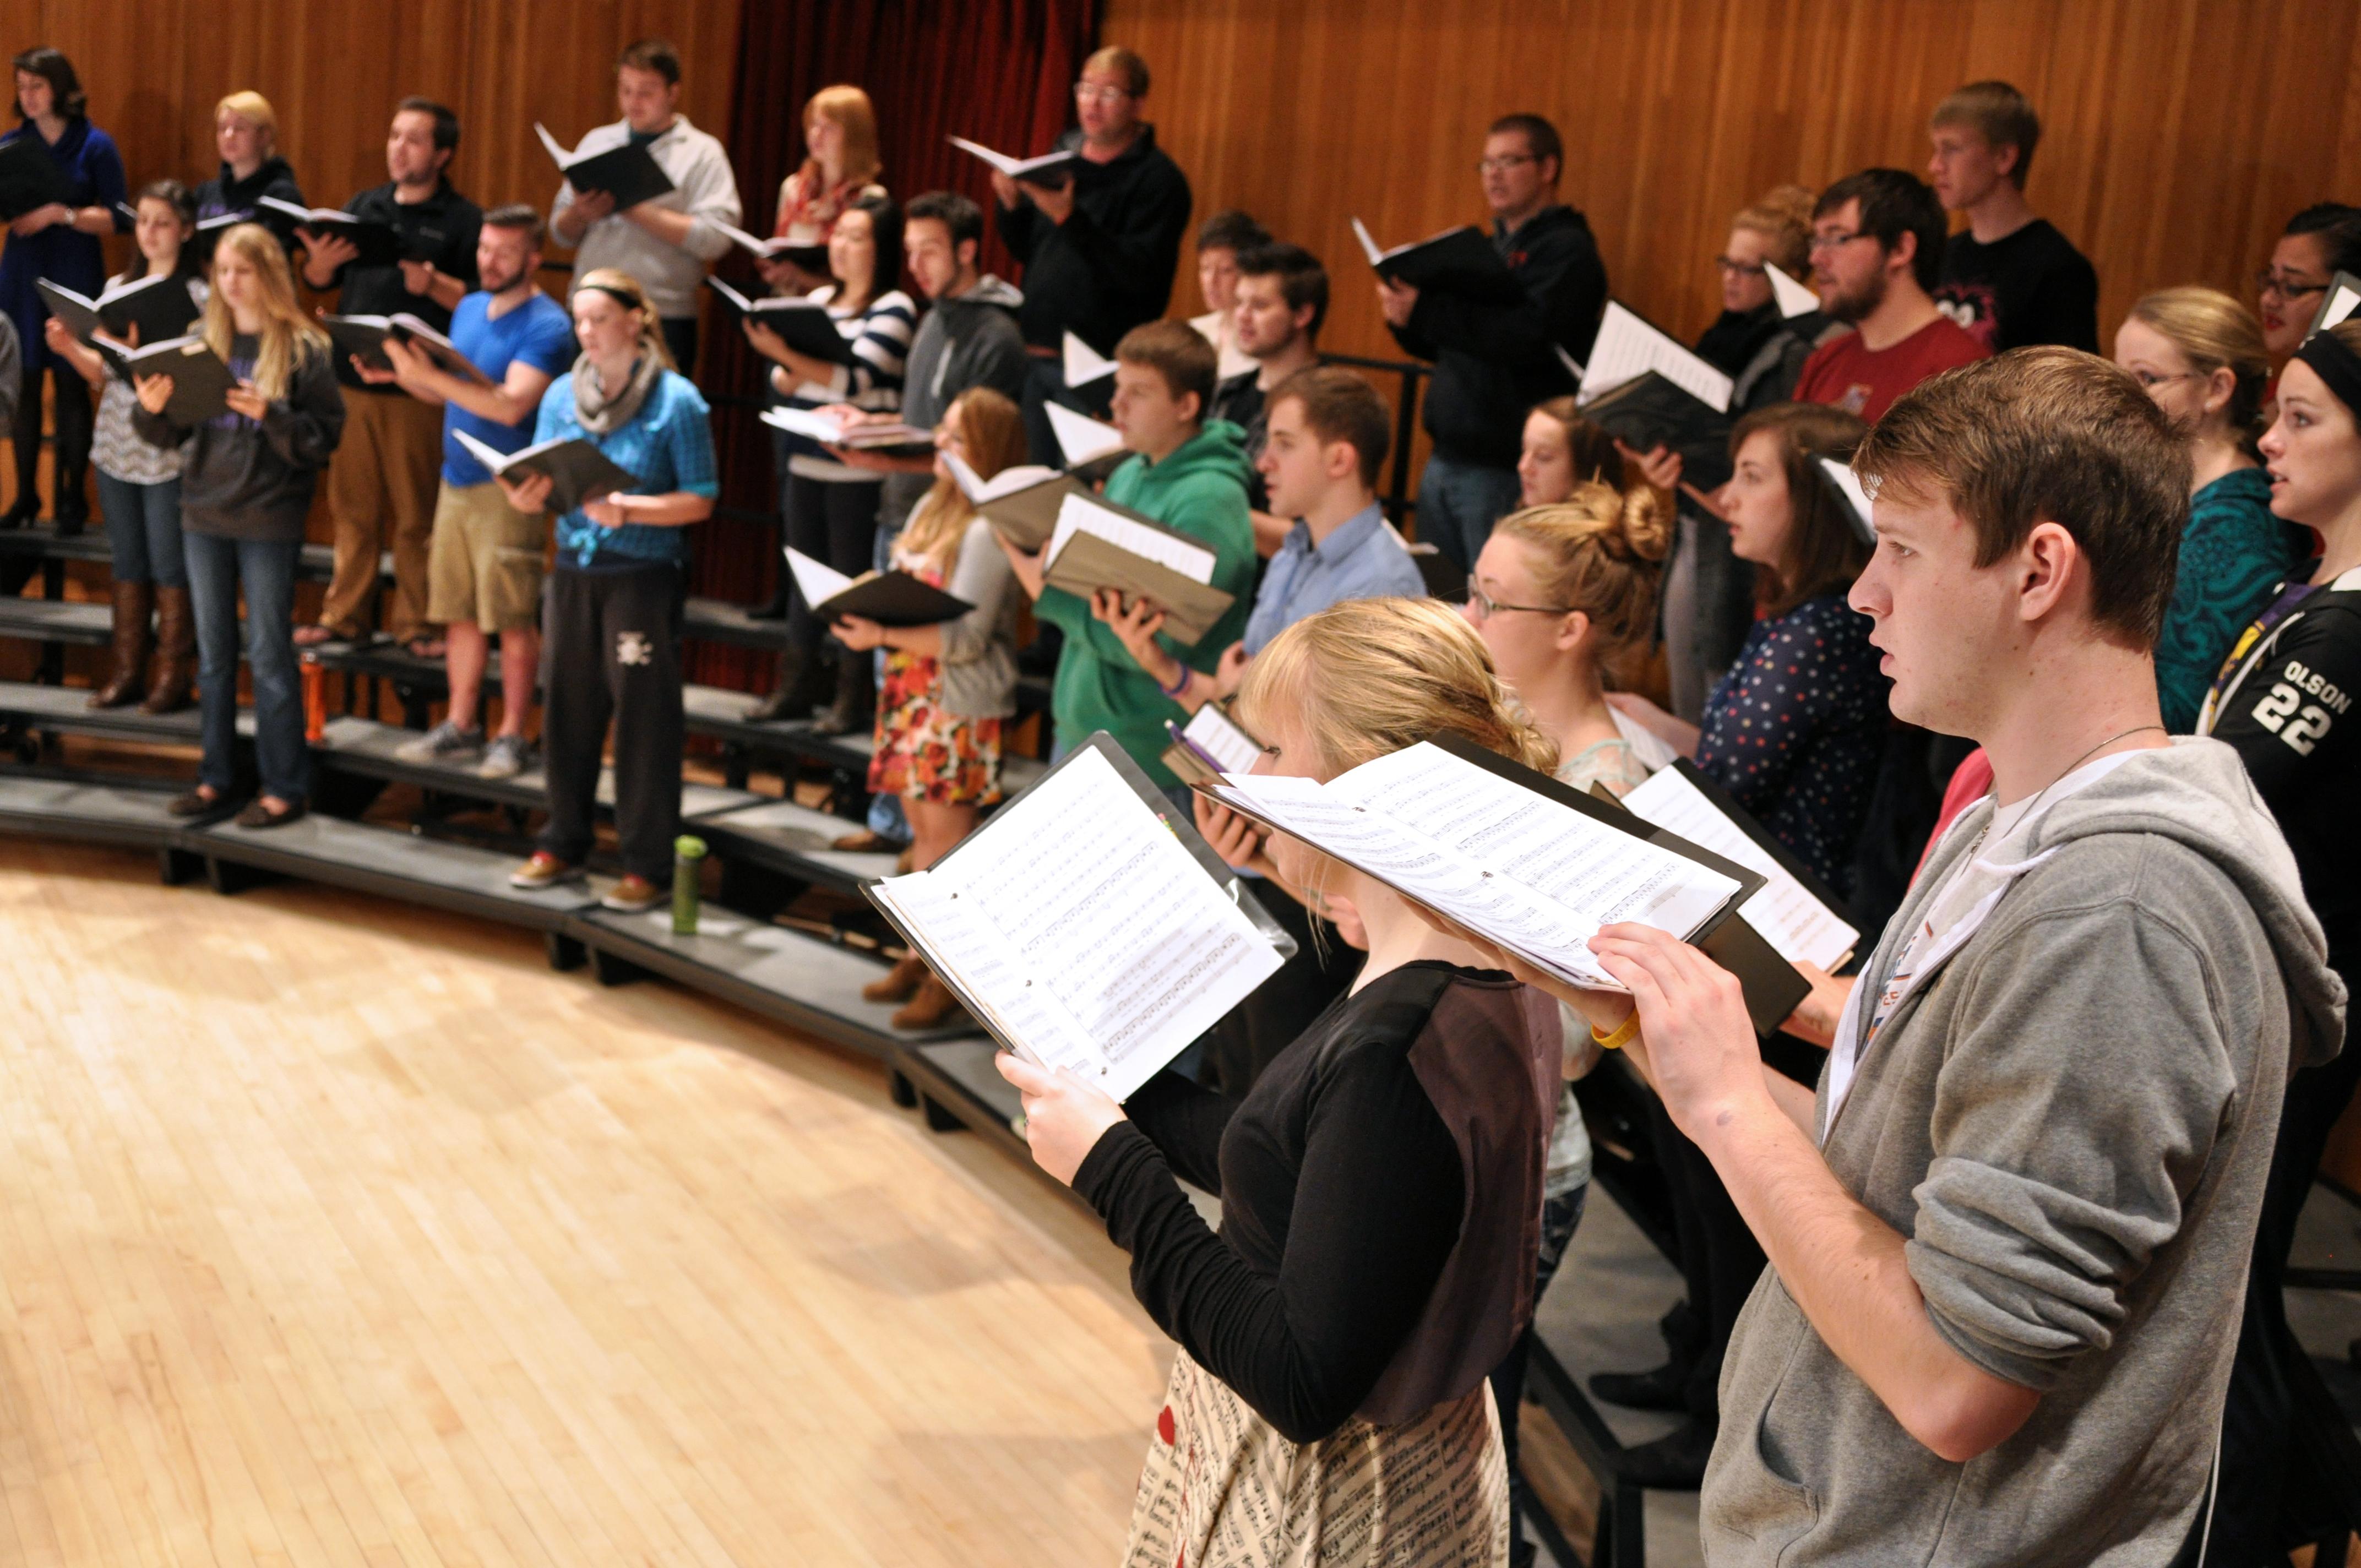 Concert Preparation Rewards Choir Students